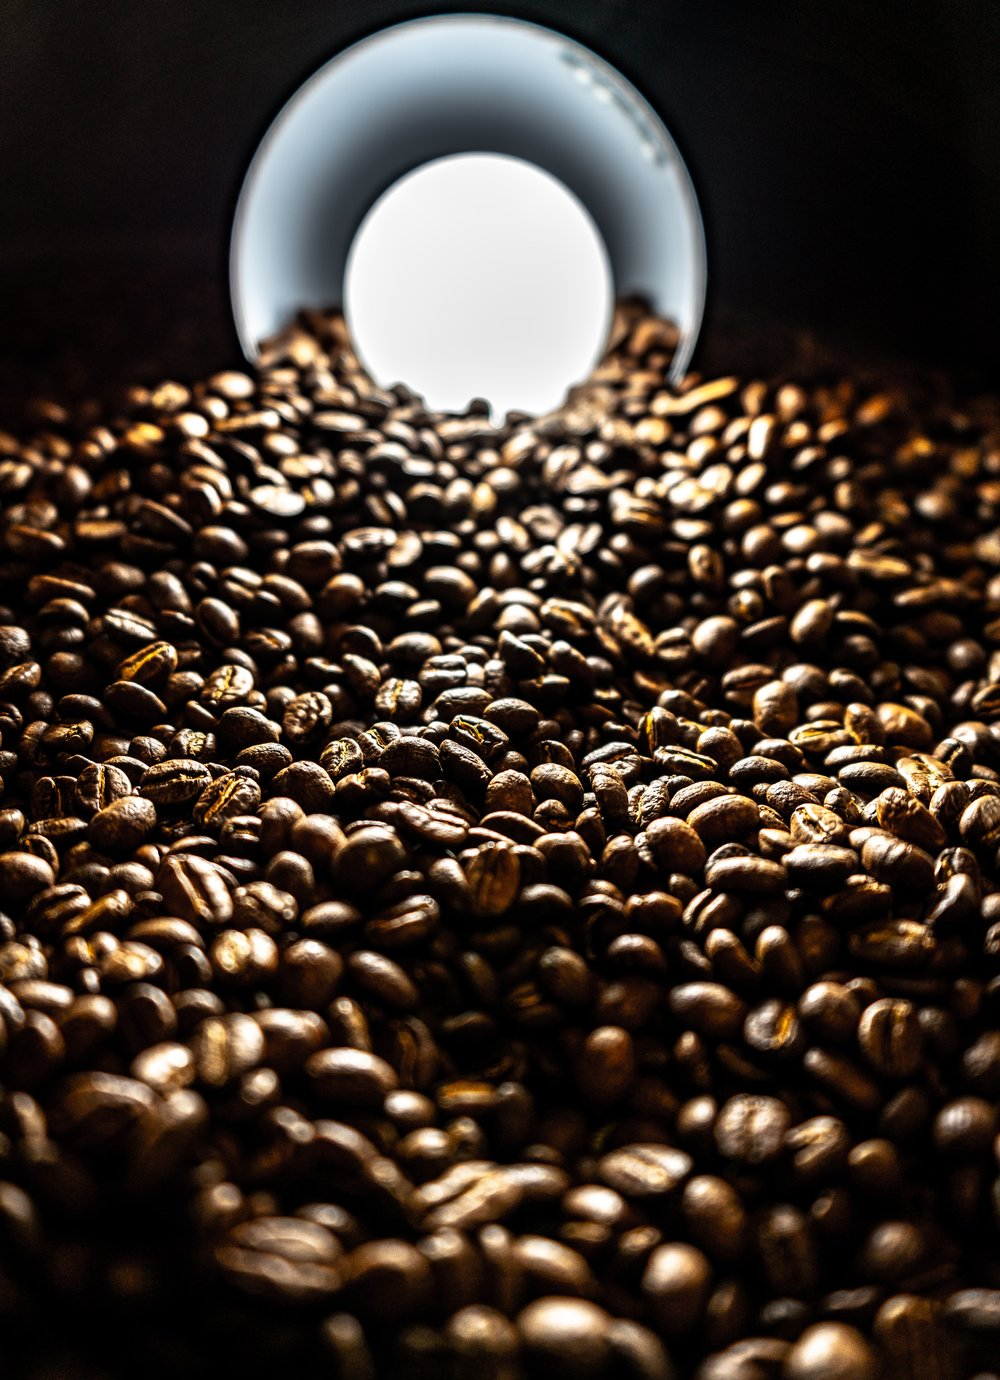 roastedcoffeebeans.jpg